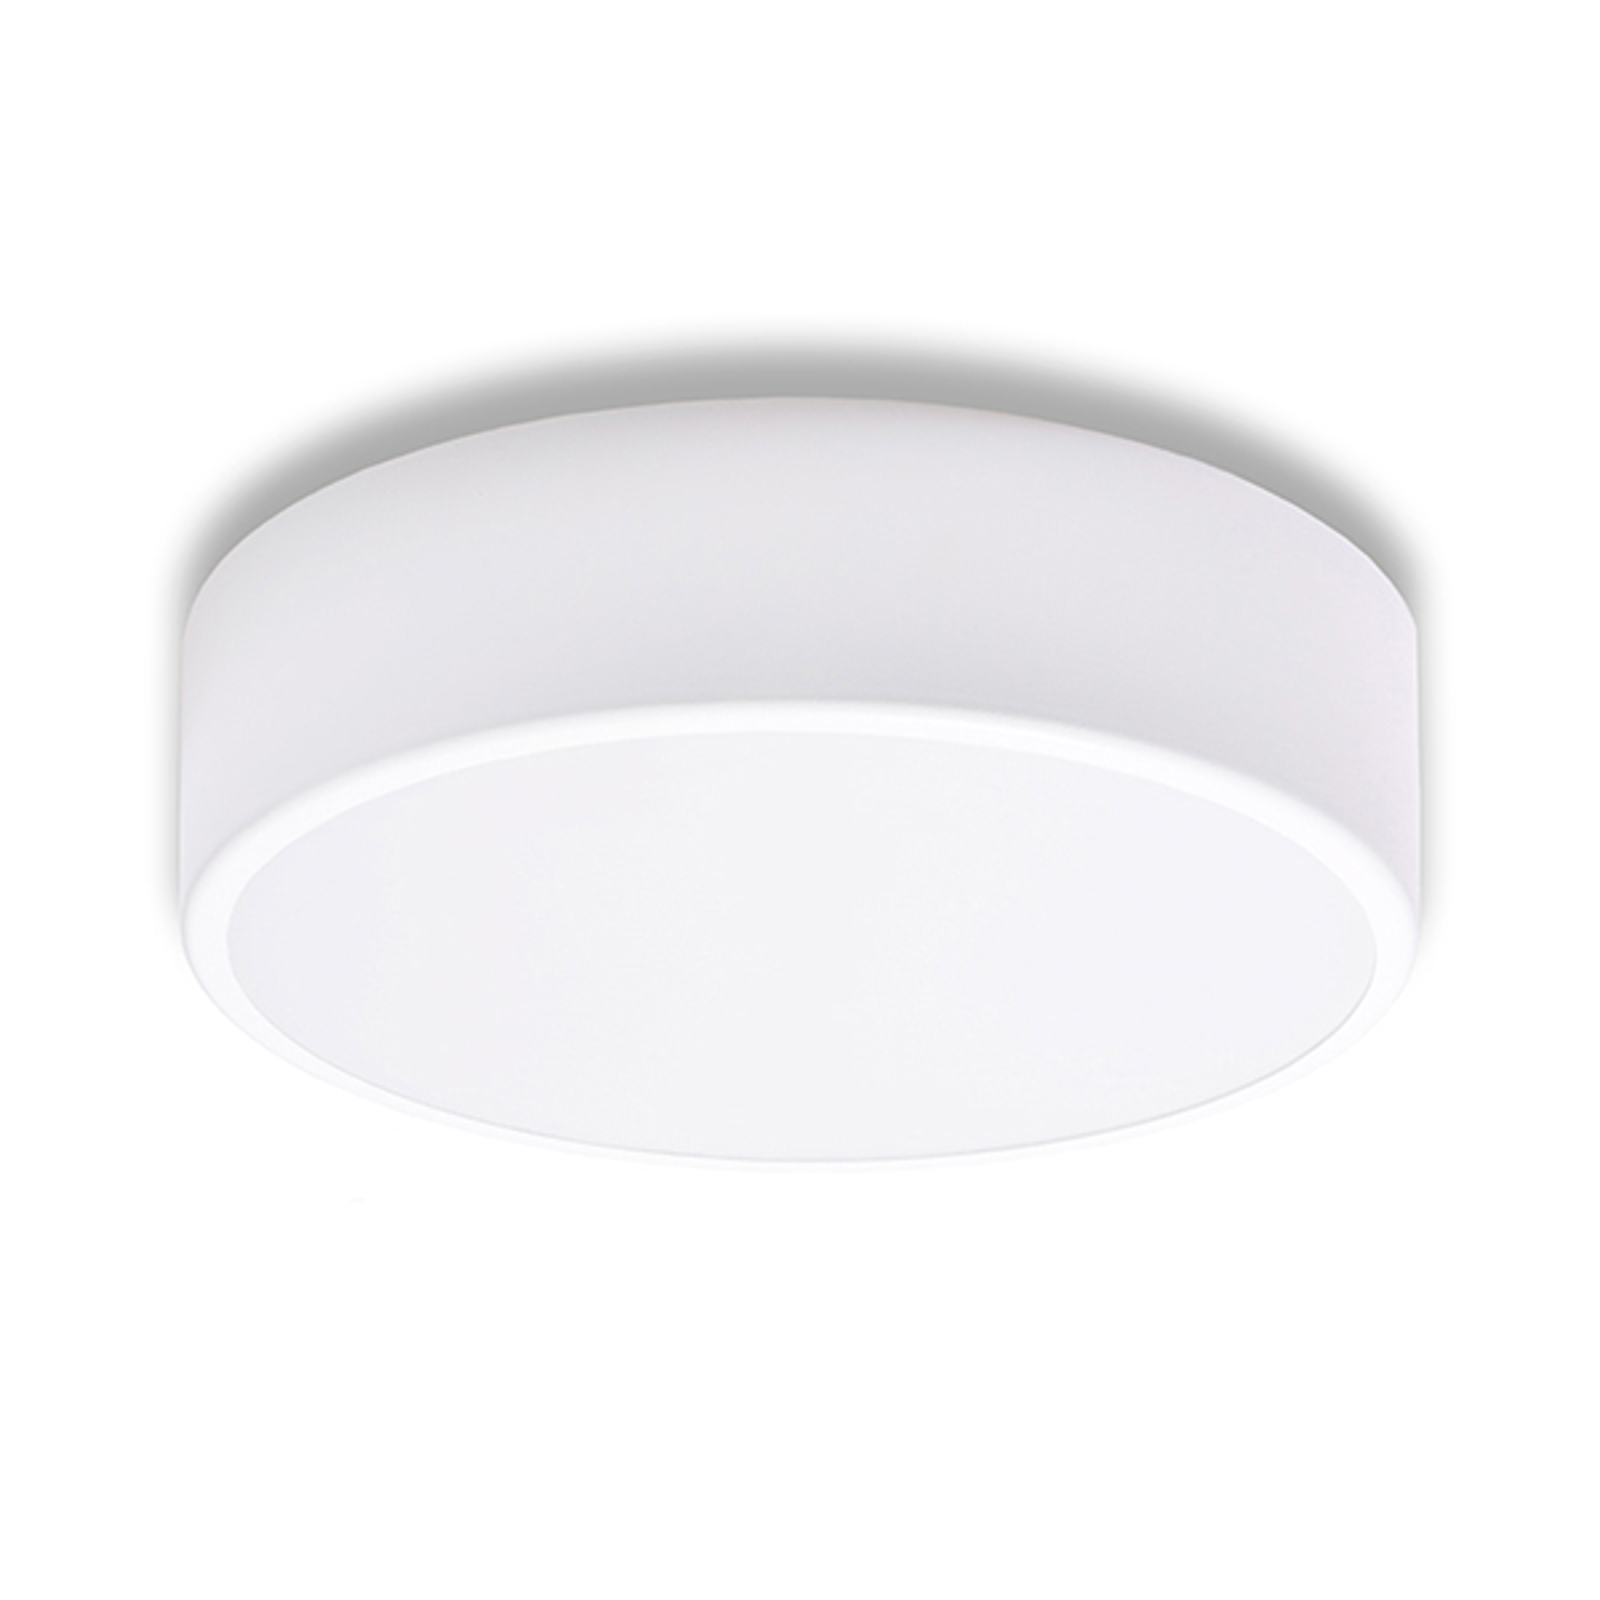 Taklampe Cleo, Ø 30 cm, hvit